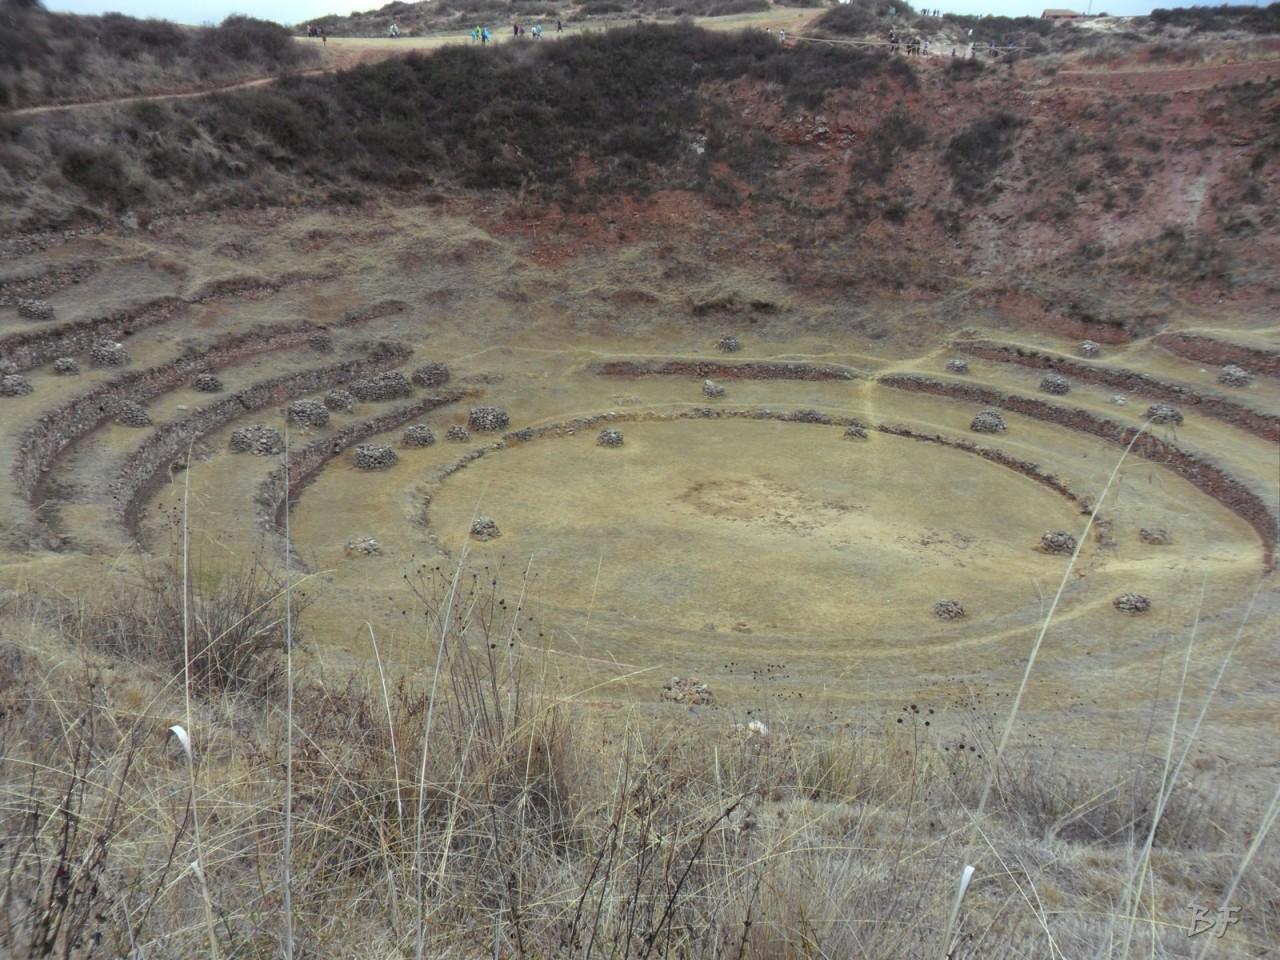 Terrazze-Circolari-Megaliti-Moray-Saline-Maras-Cusco-Perù-8